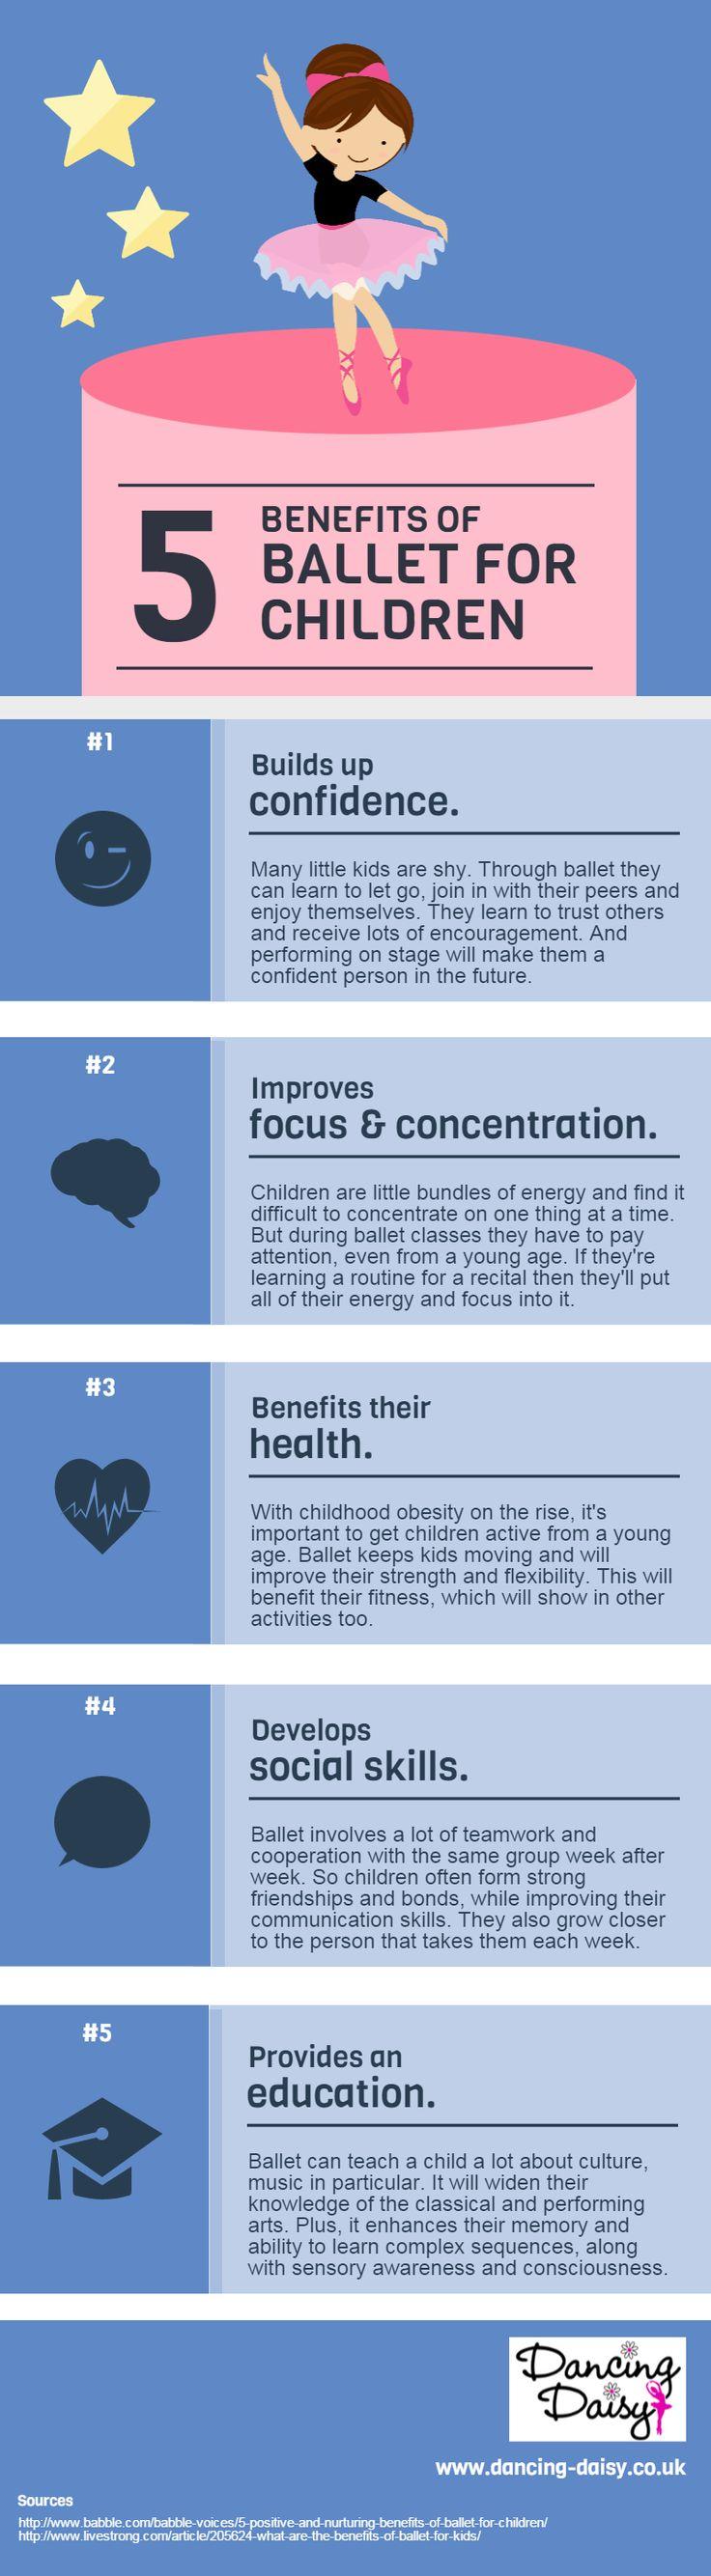 5 Benefits of Ballet for Children